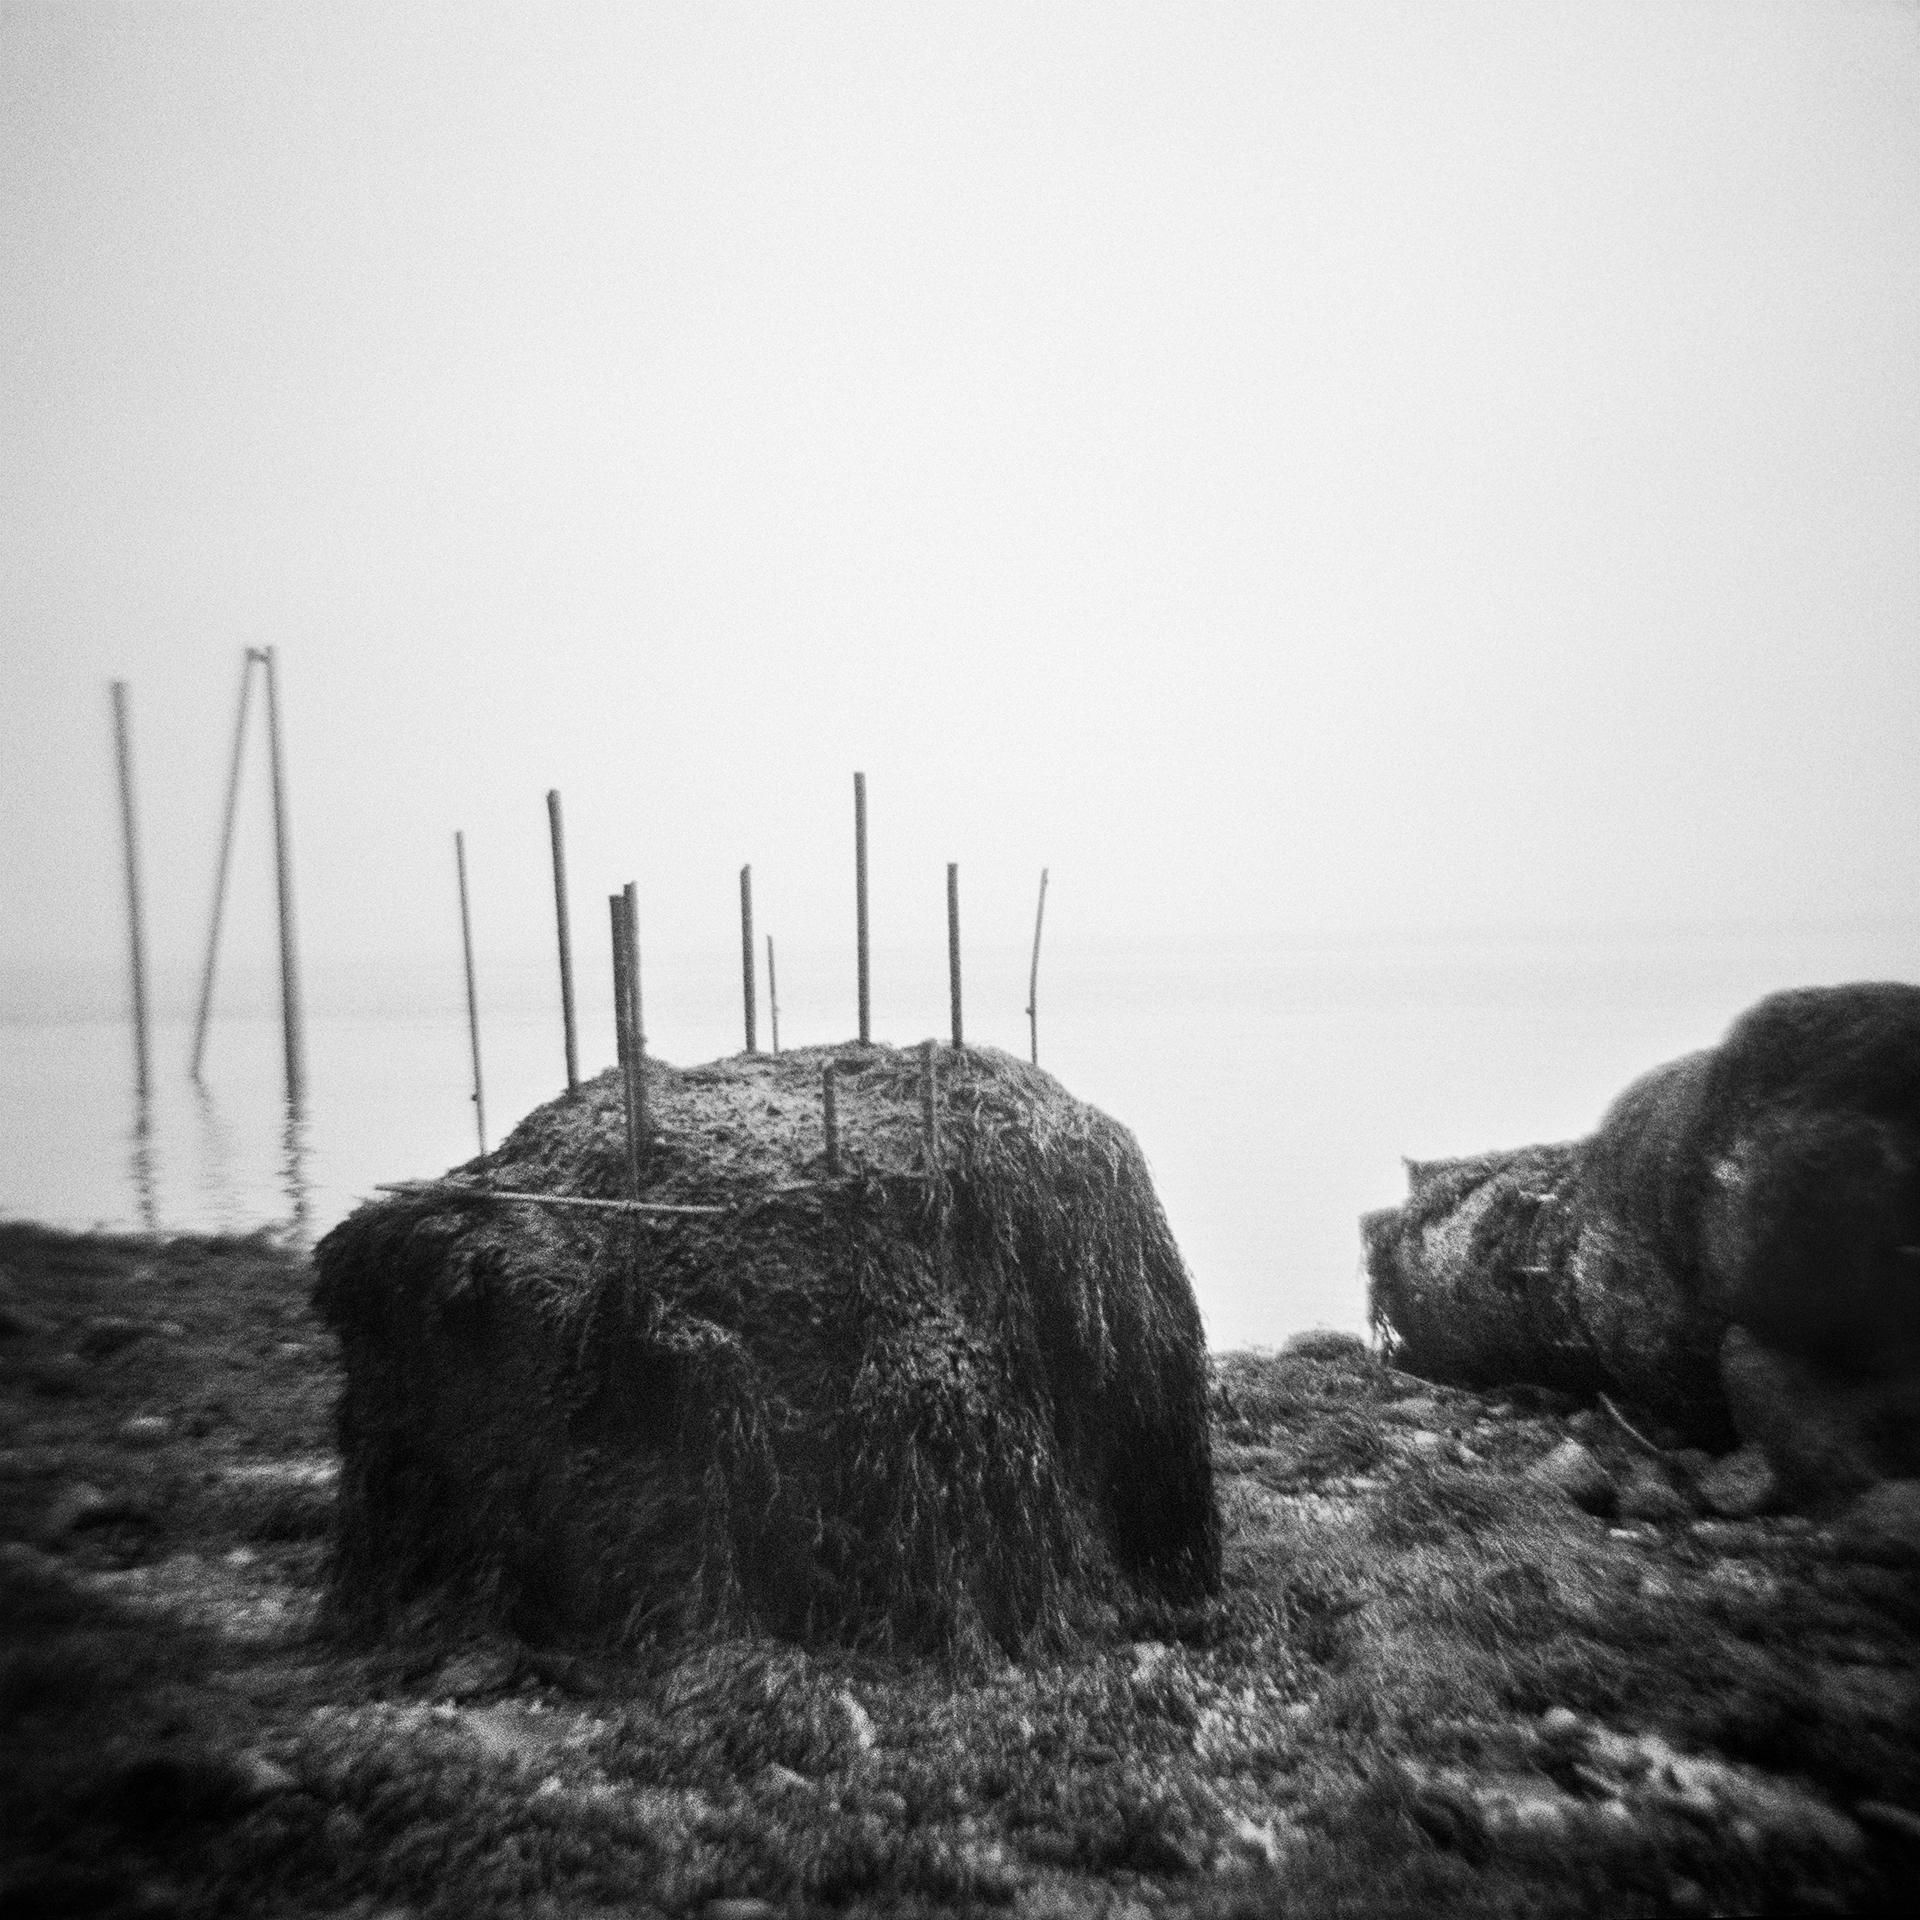 Untitled (rocks, rods), 2014